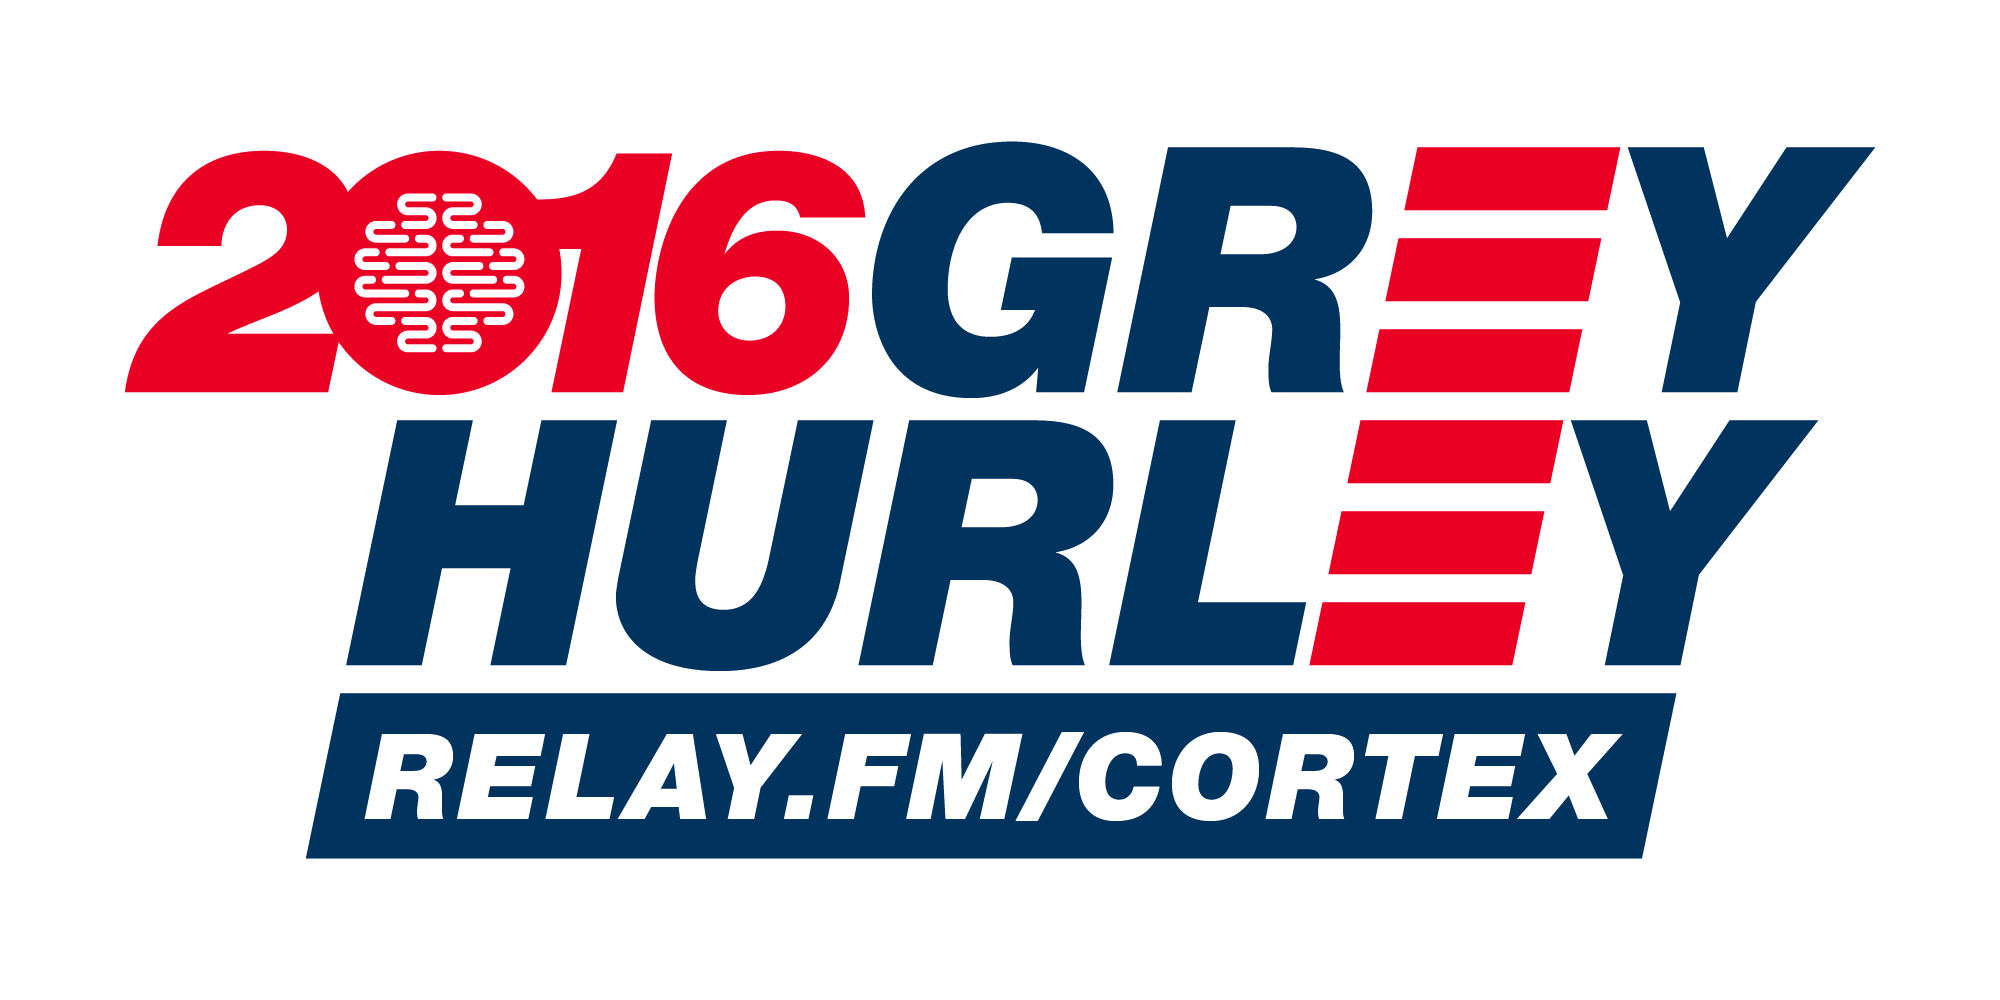 Grey-Hurley-2016